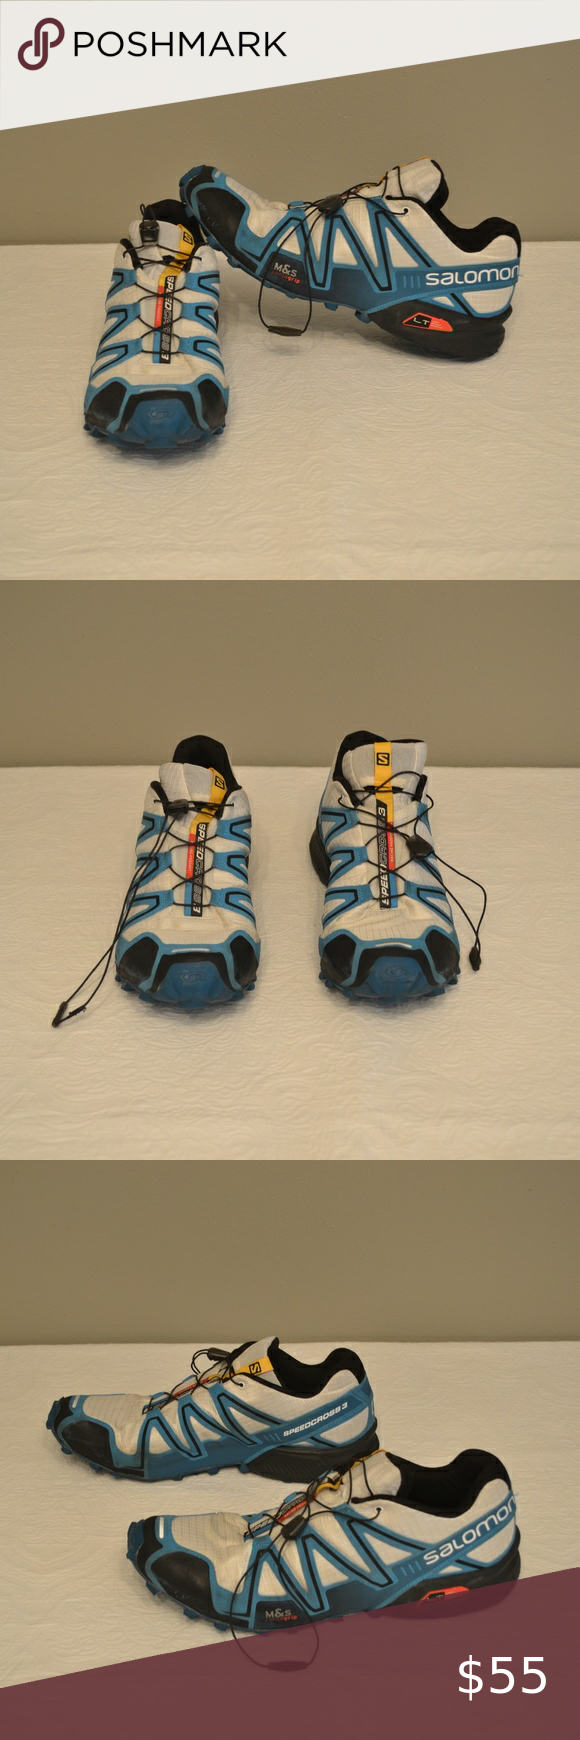 SALOMON Men's Speedcross 3 Shoes size